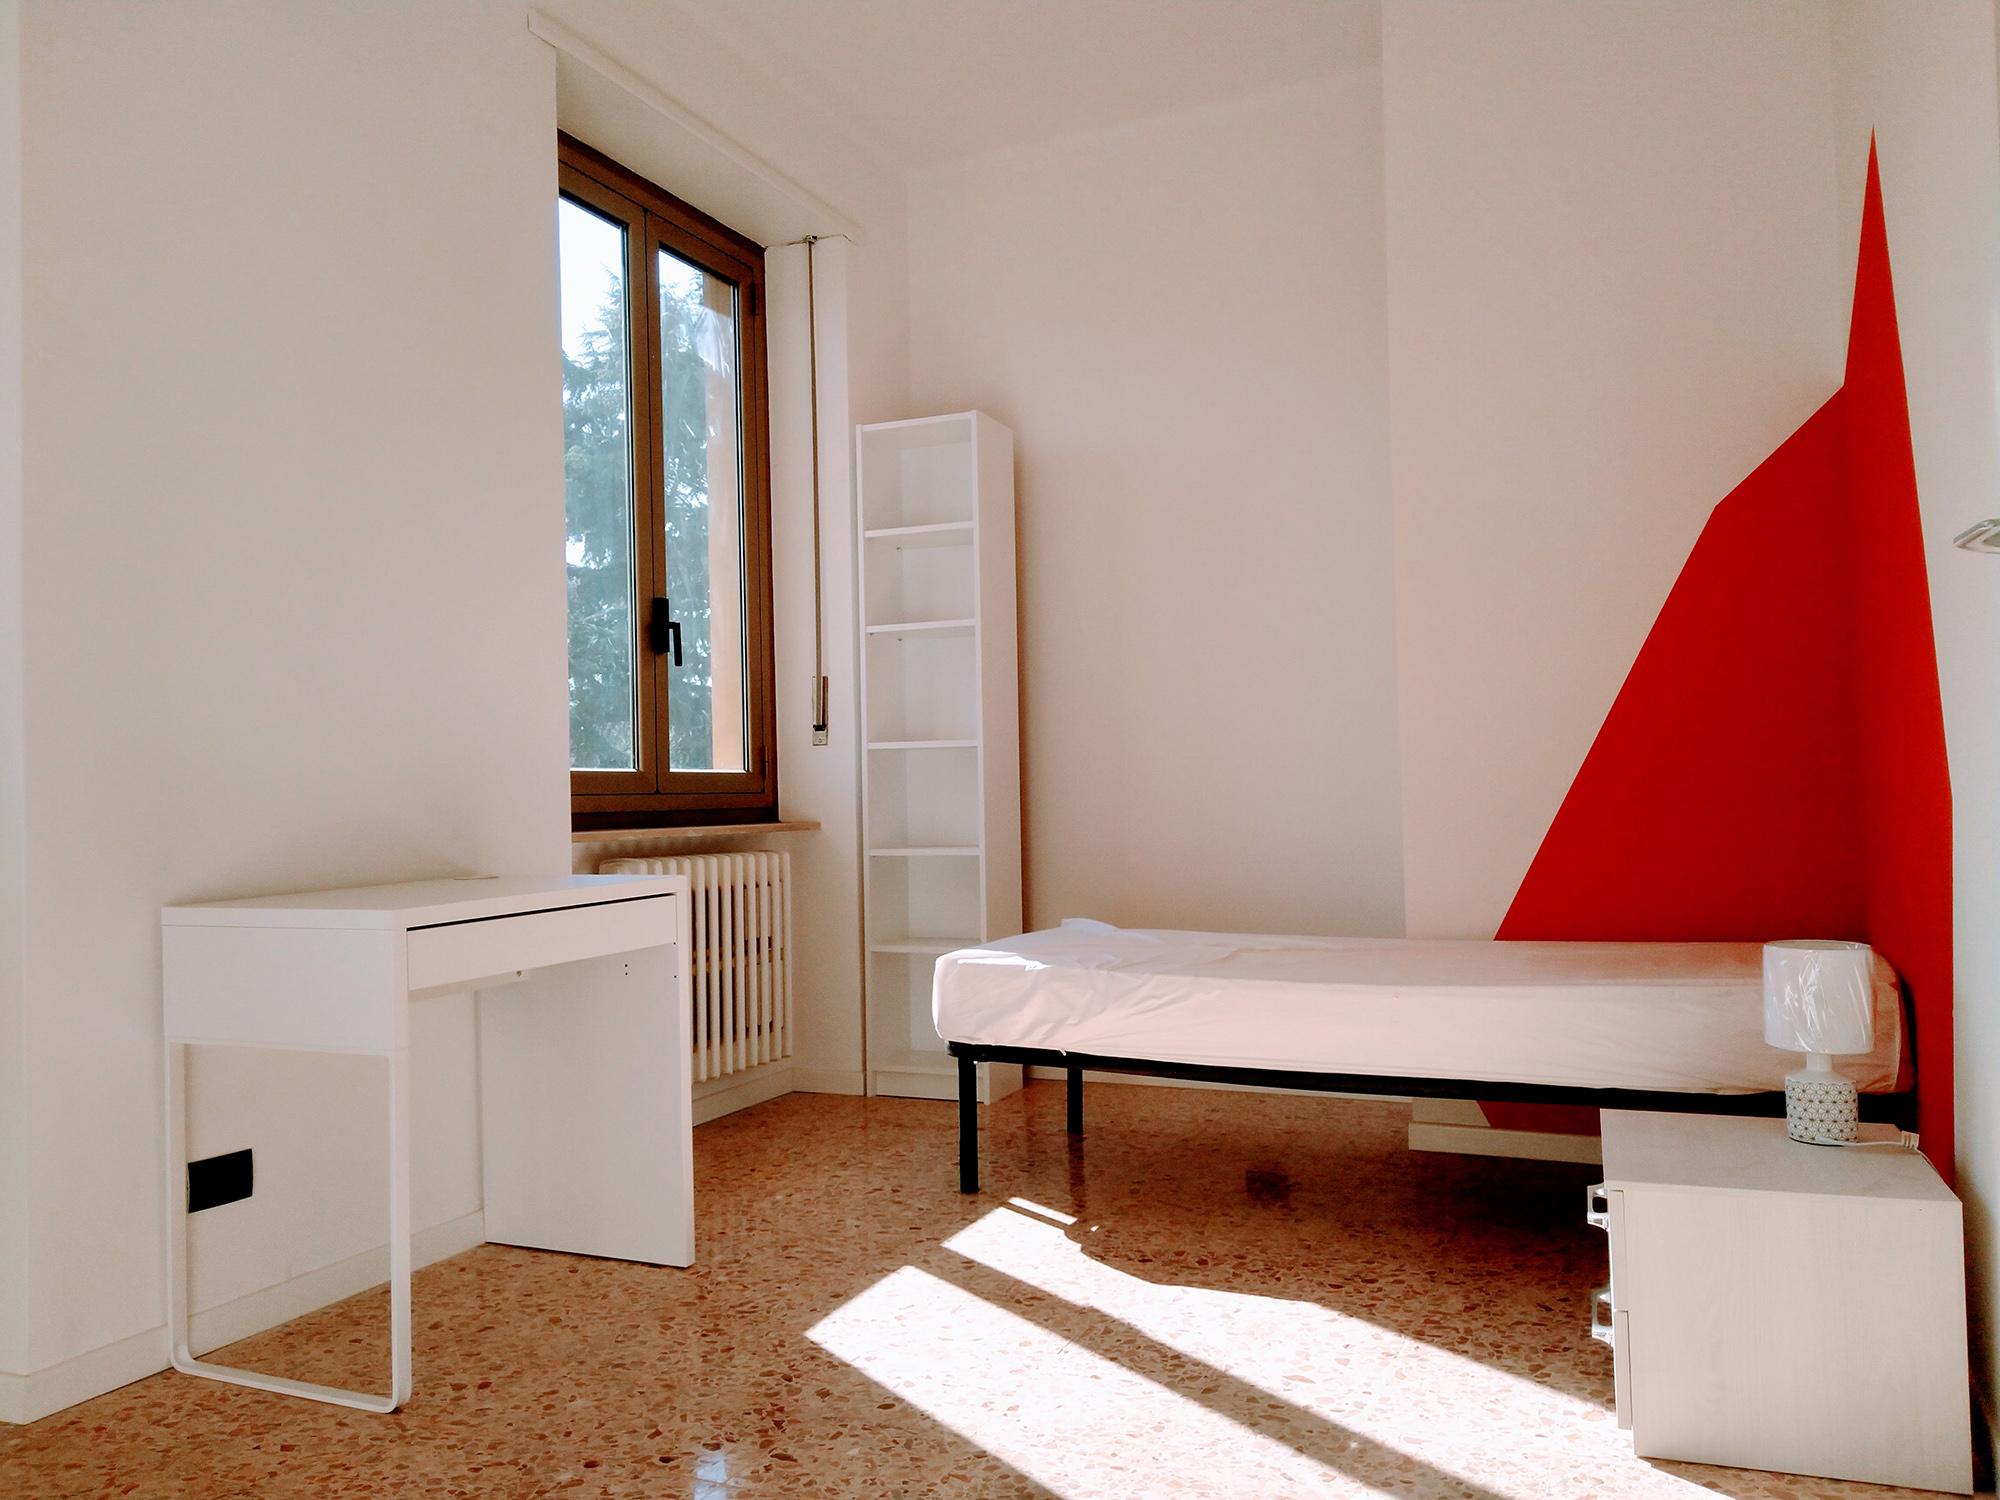 Camera singola per city users Ma.Ri. House Torino - cohousing torino